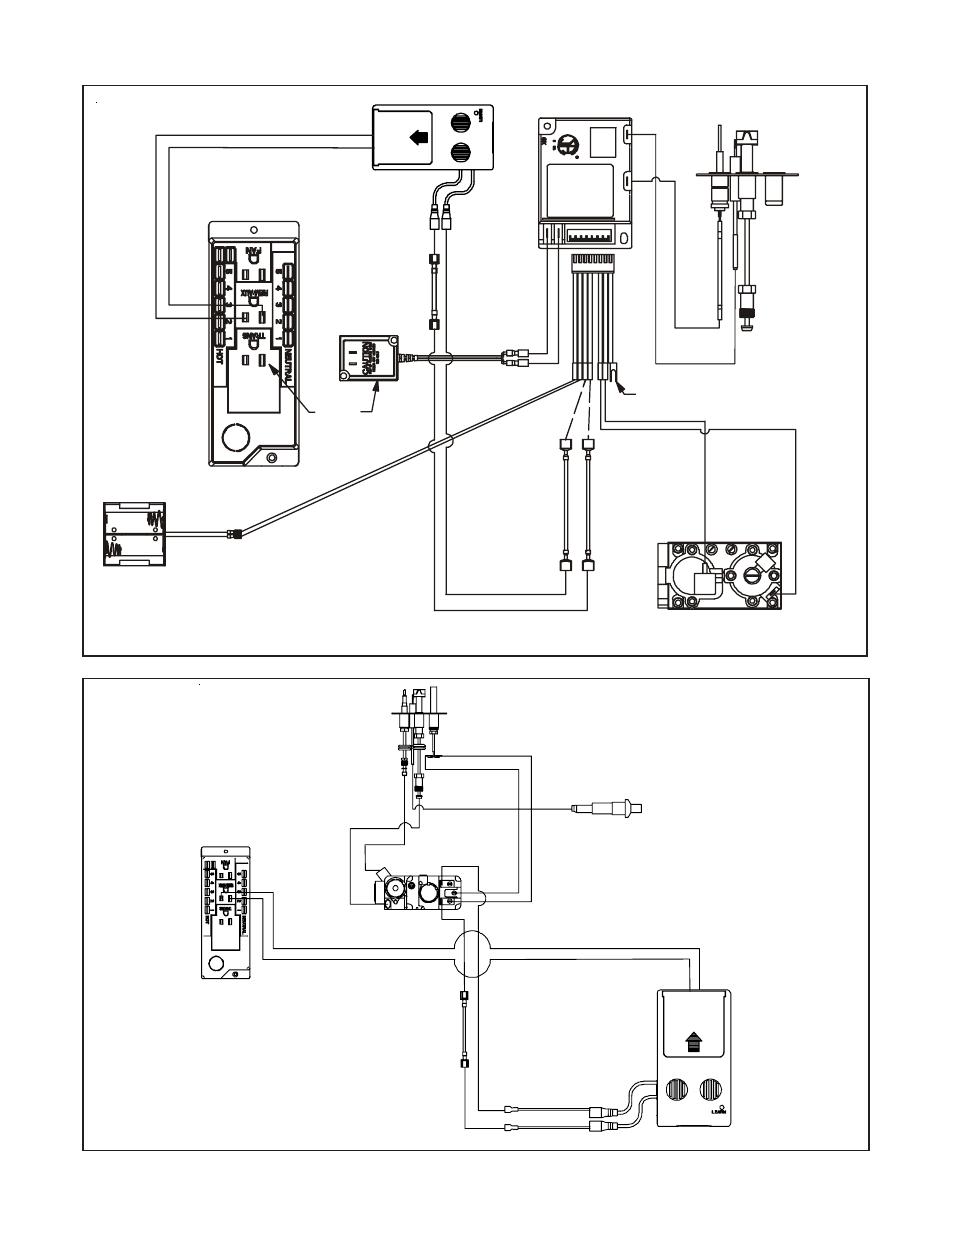 Diagram Ford Flex Dvd Wiring Diagram Full Version Hd Quality Wiring Diagram Schematicny2j Eticaenergetica It